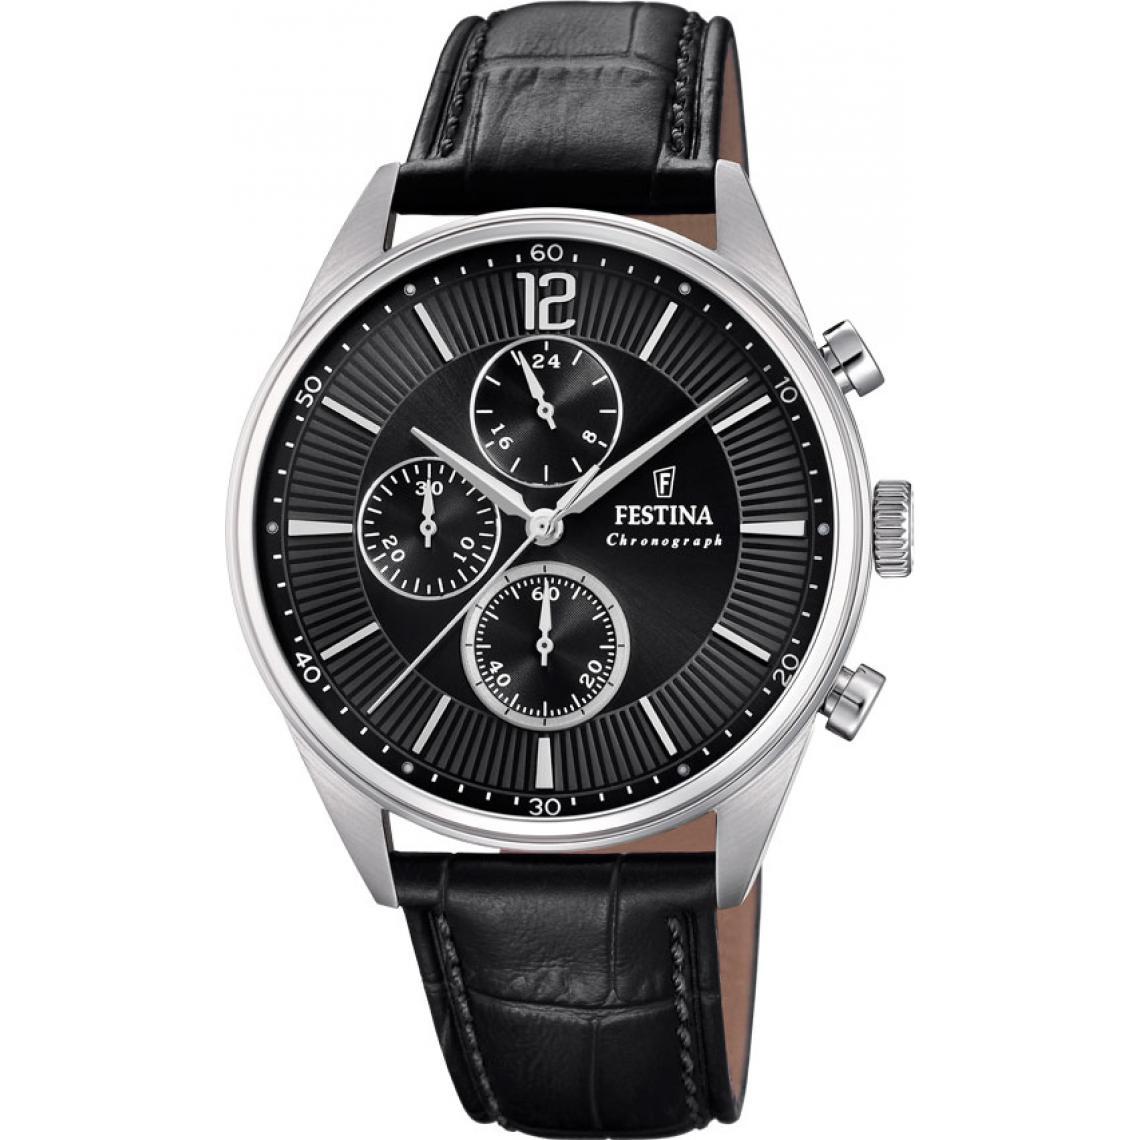 Montre Timeless Chrono F20286-4 - Montre Chronographe Cuir noir Montres - Festina - Modalova